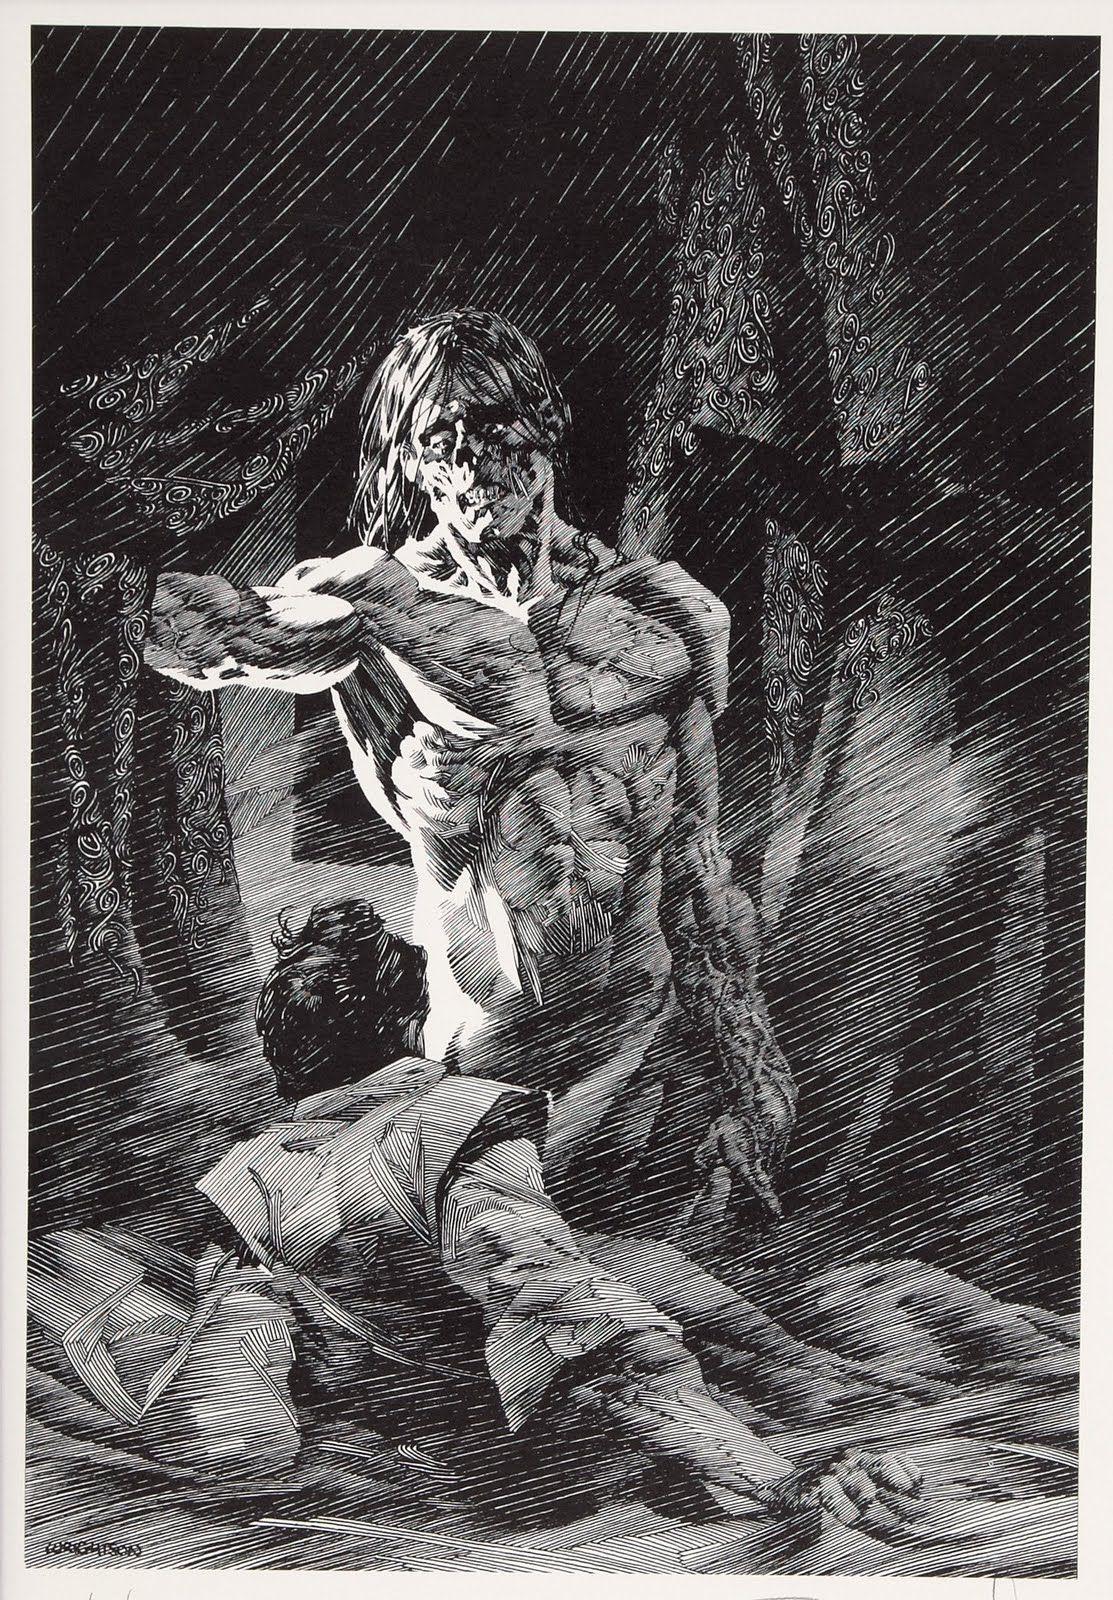 Theremina Bernie Wrightson Illustrations Of Mary Shelleys Frankenstein